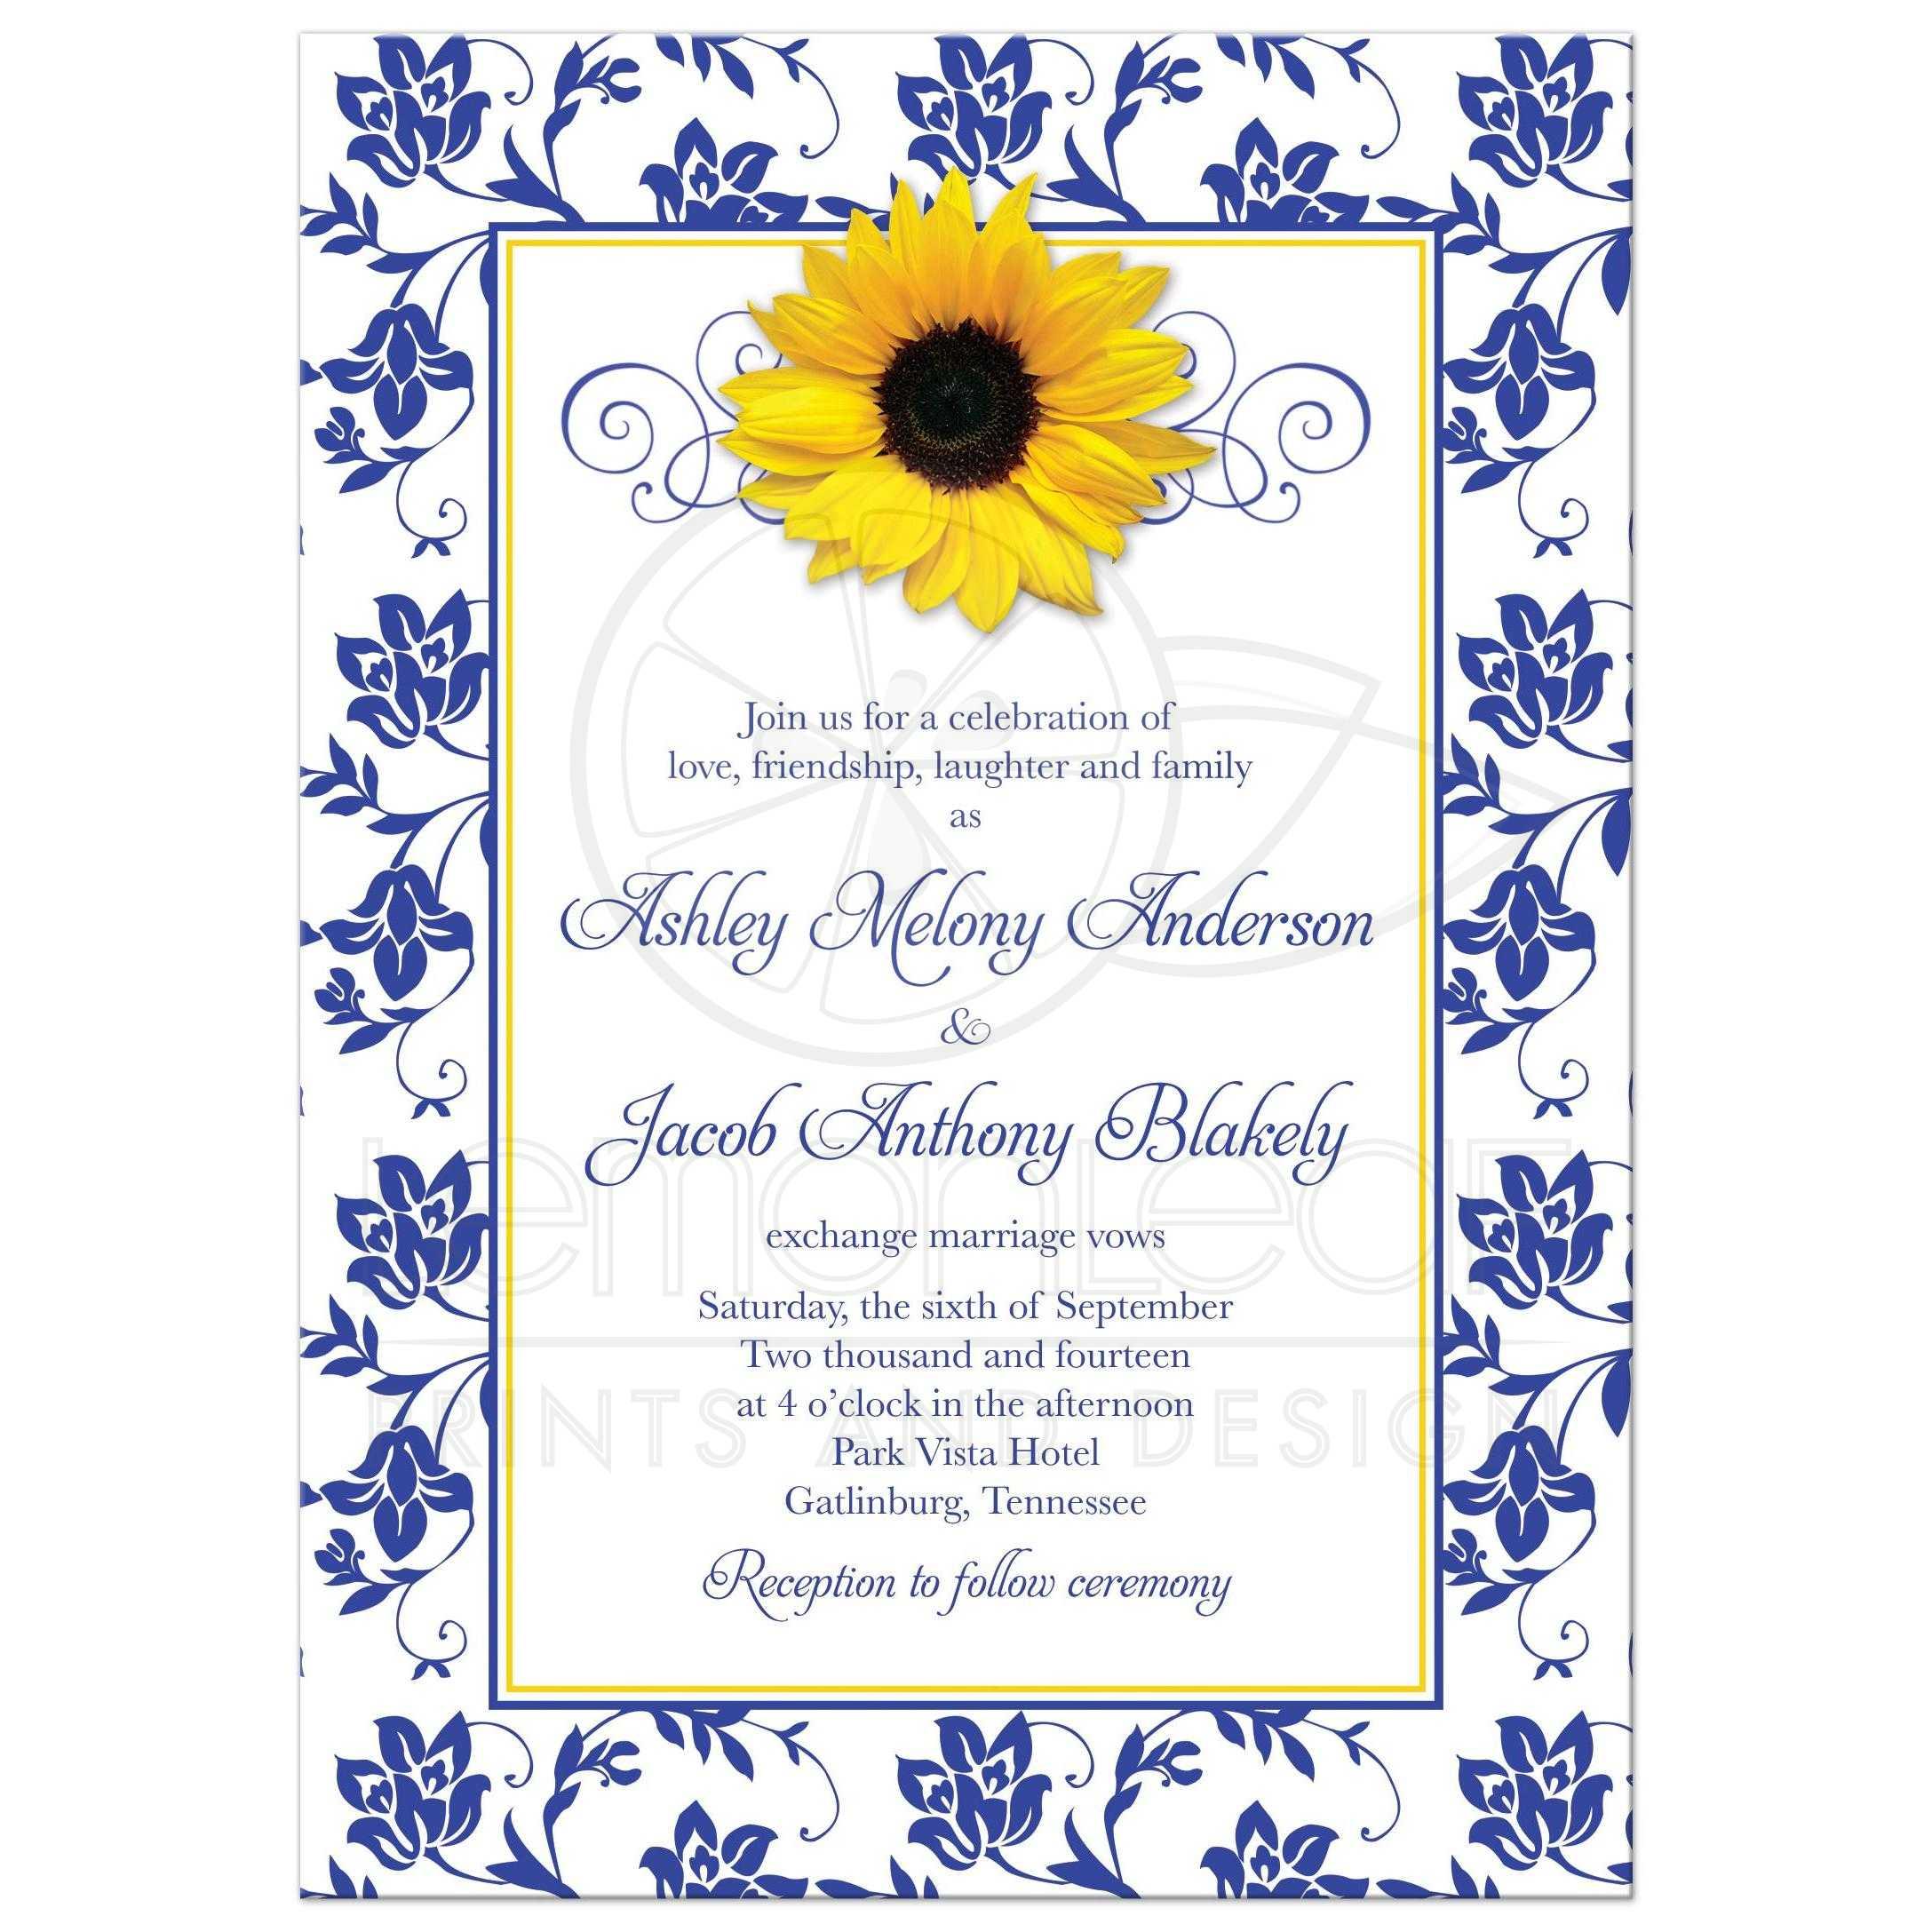 photo wedding invitation  sunflower damask royal blue yellow